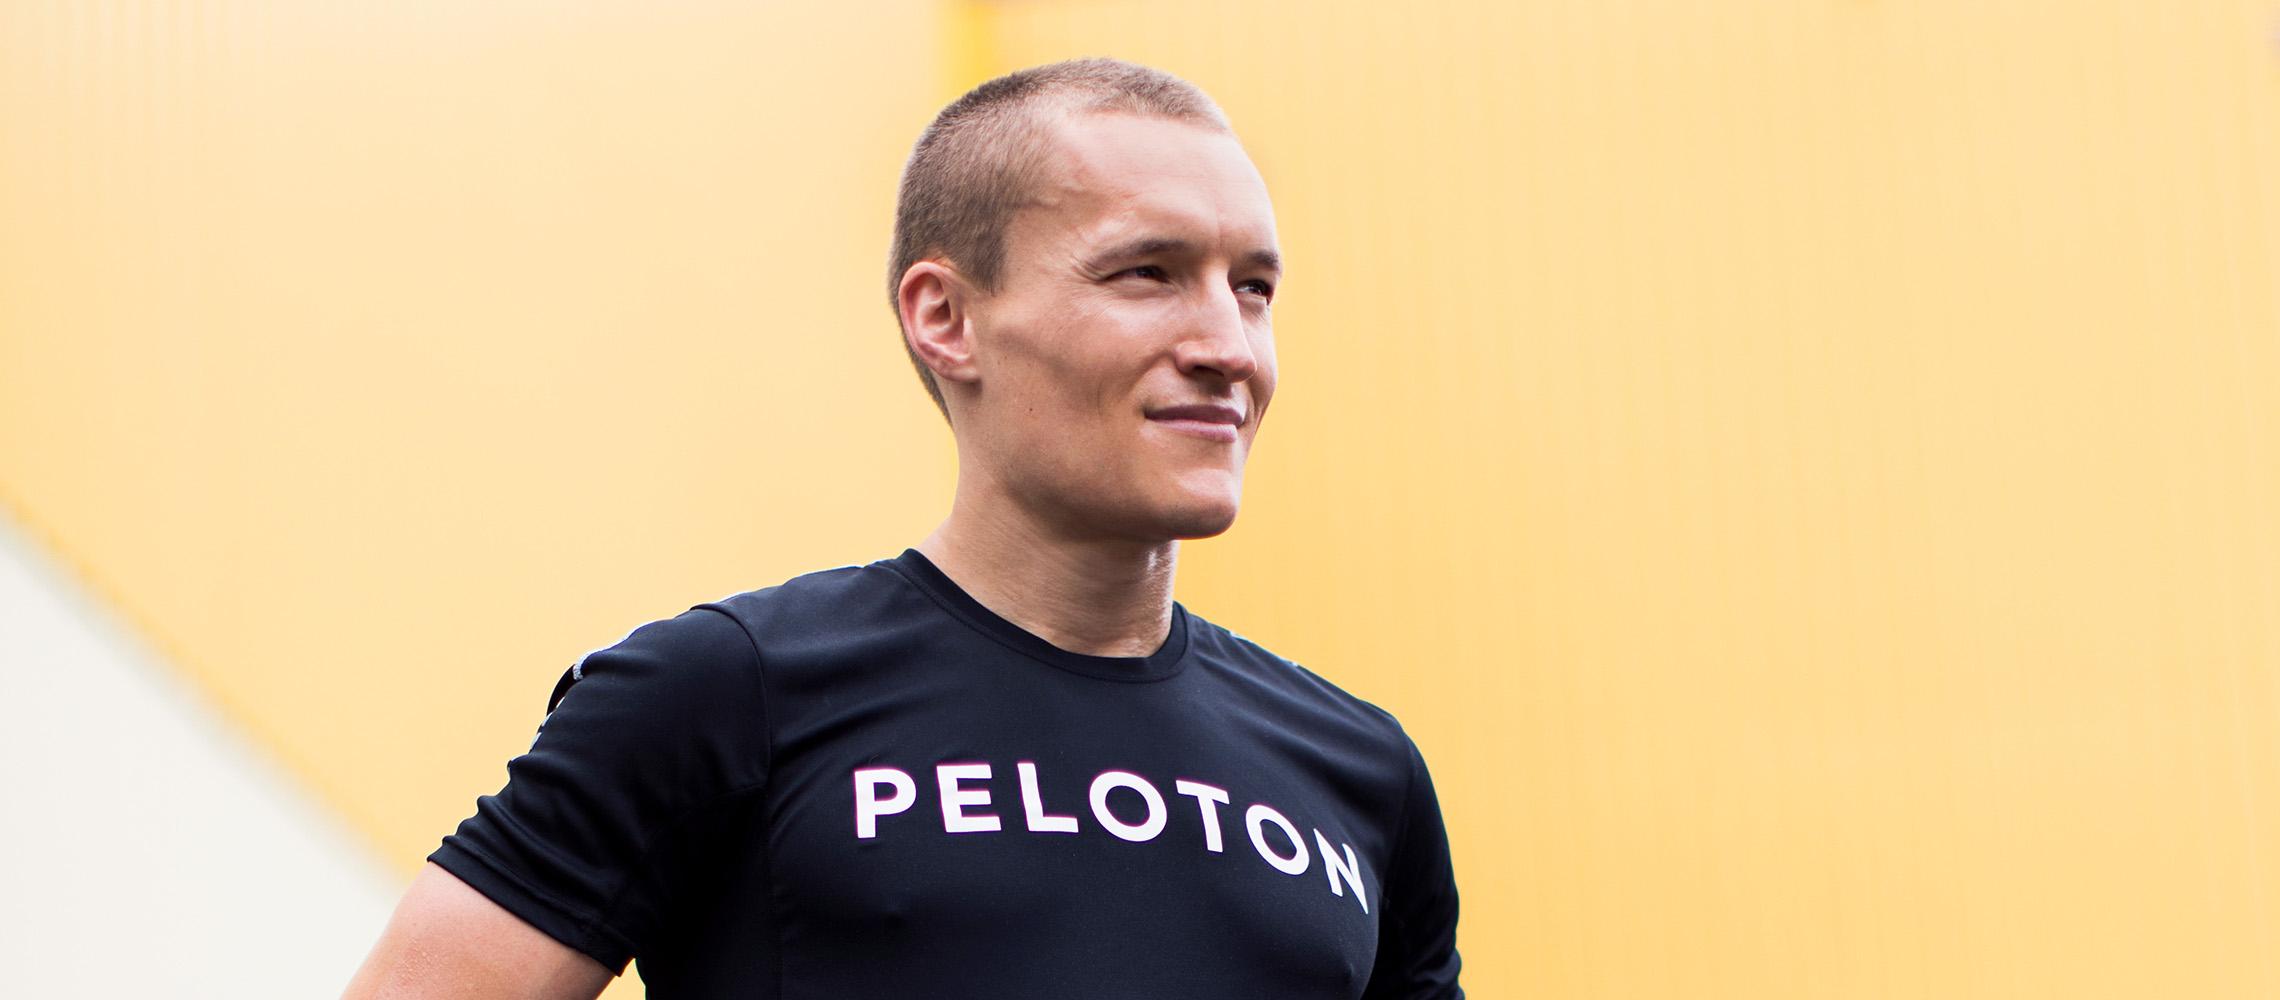 Peloton: Maximize Your Workout - Power Zone Training FAQs image